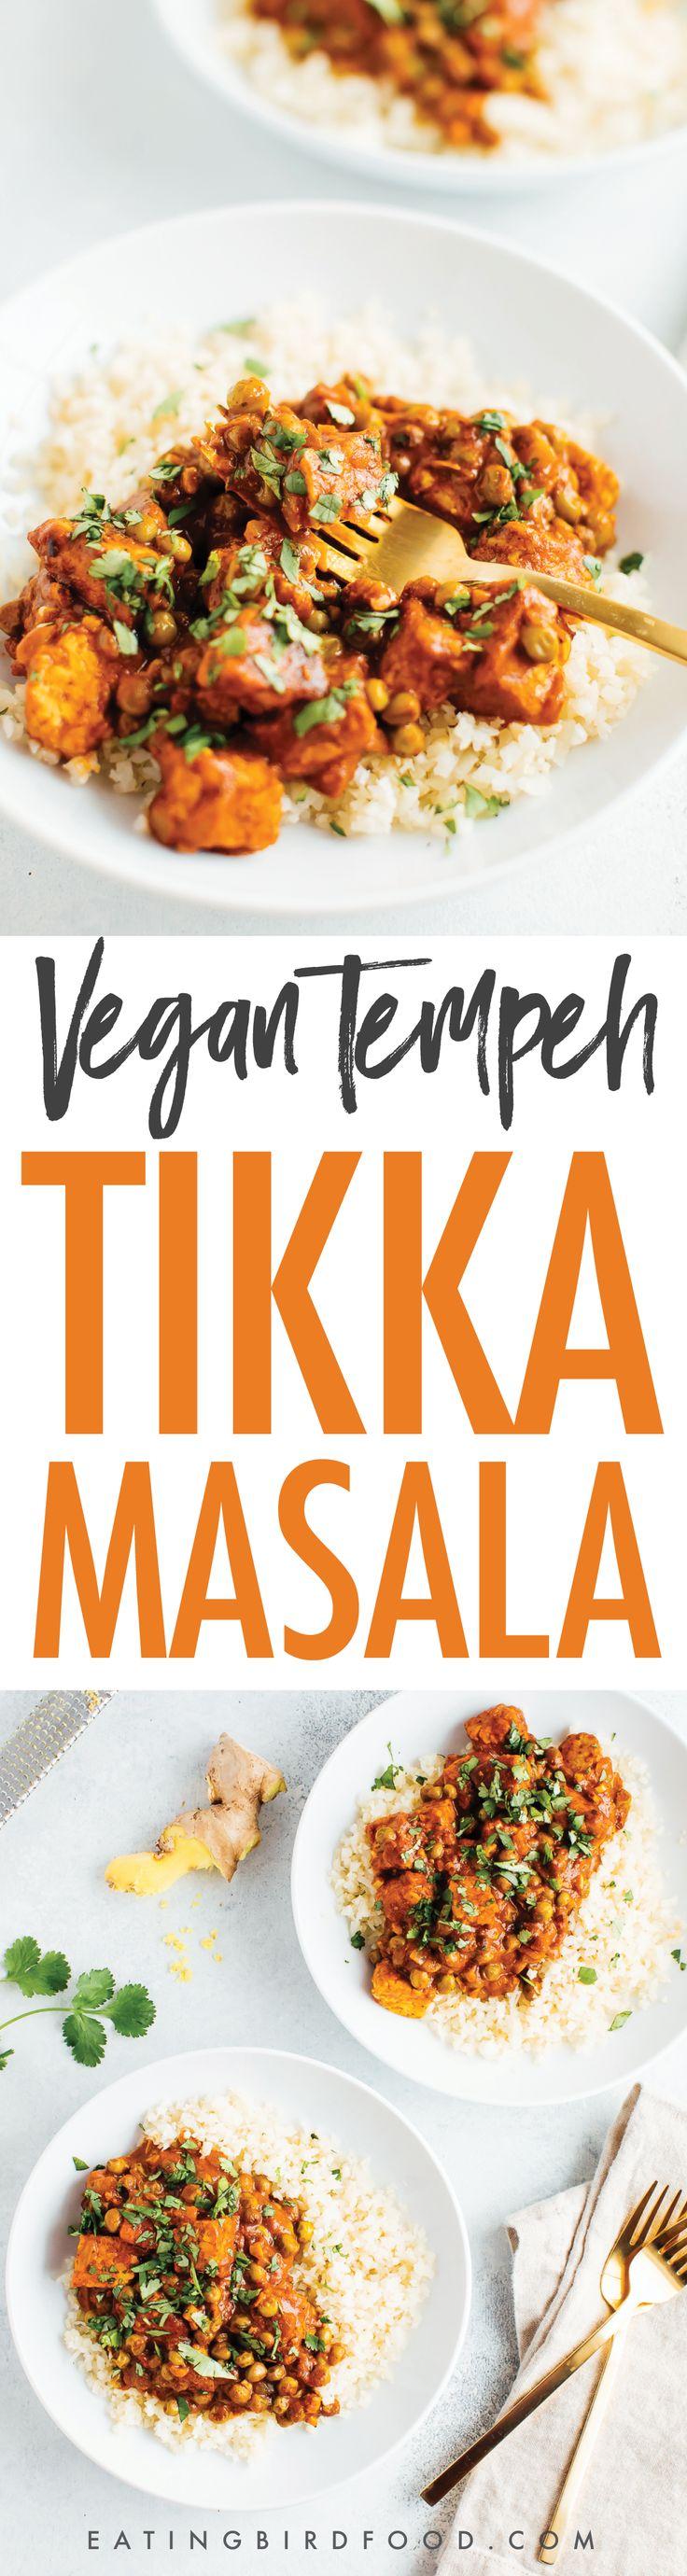 The BEST Vegan Tempeh Tikka Masala #vegan #healthy #tempeh #tempehrecipes